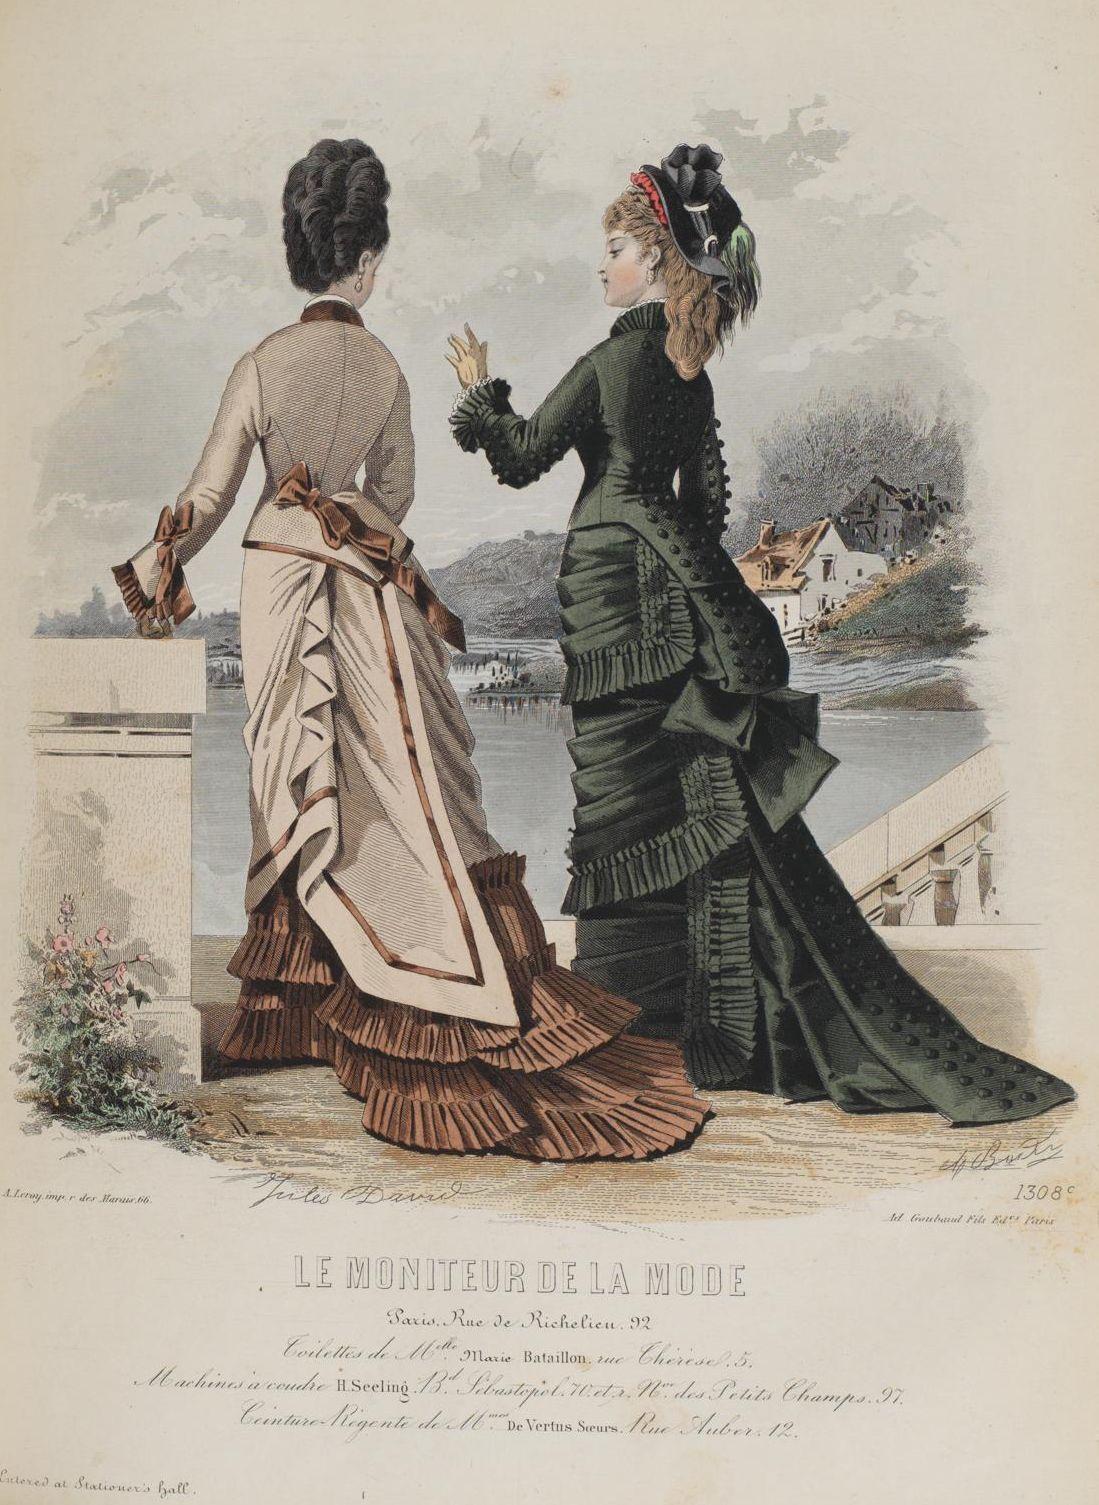 Le Moniteur de la Mode 1876 #englishdresses1880